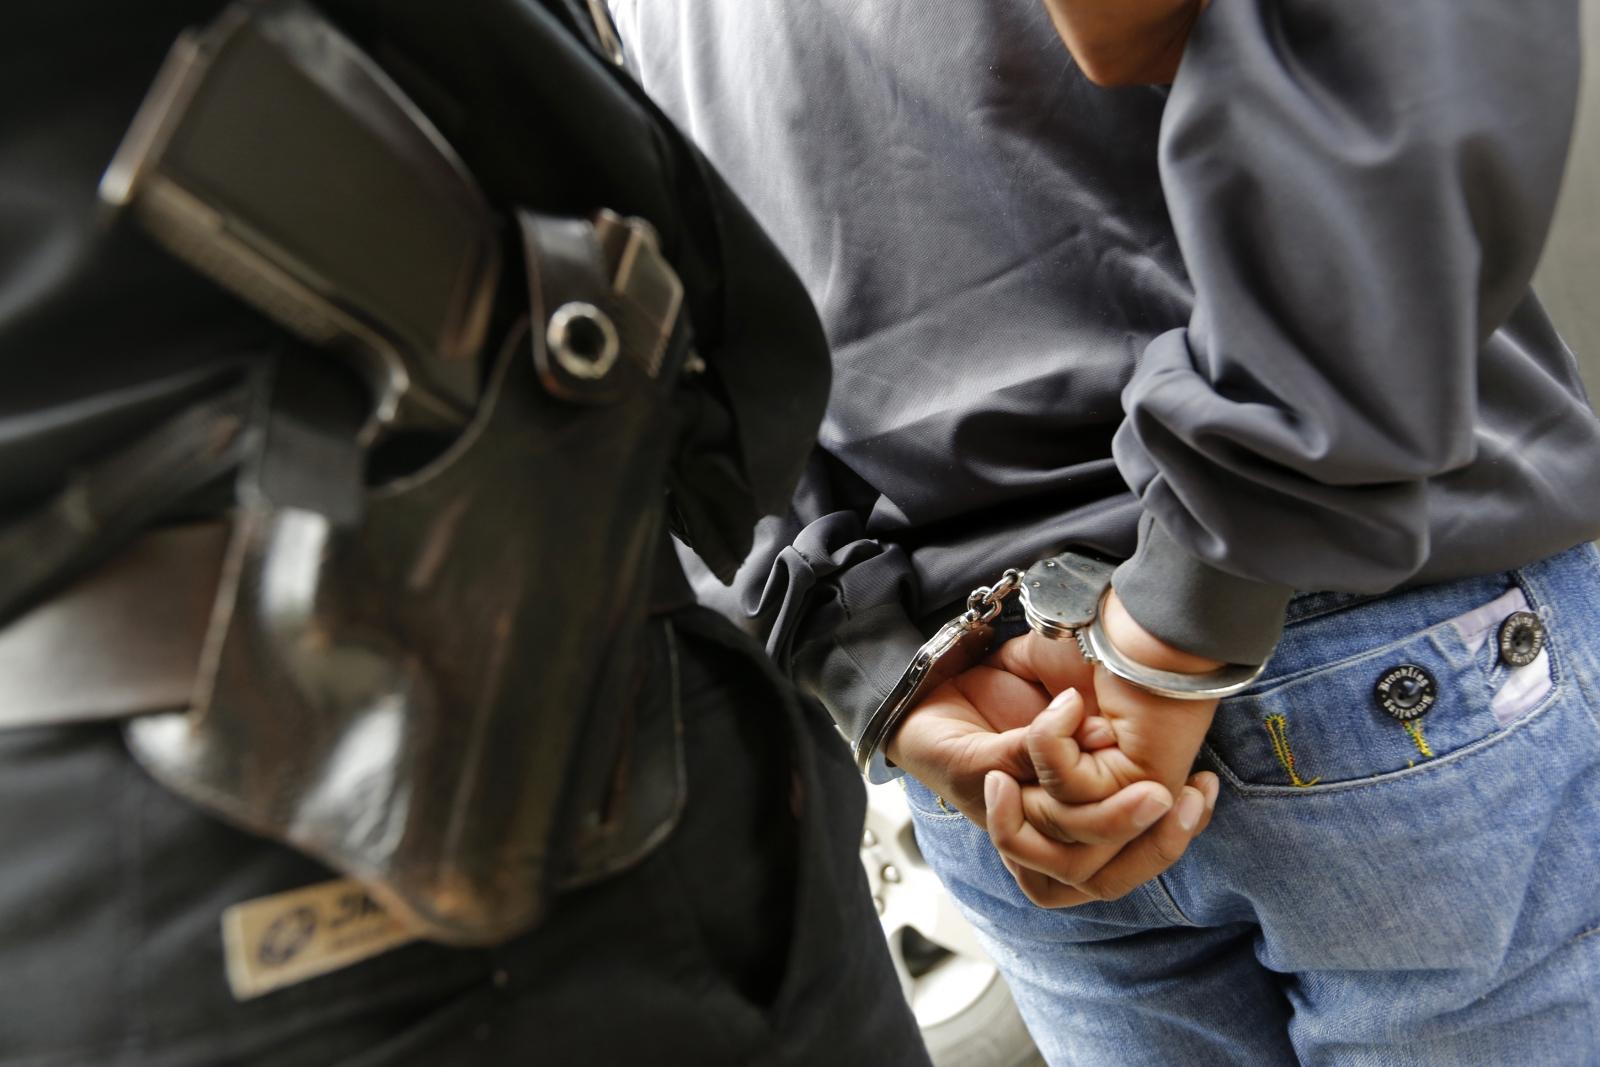 New Mexico man Torrez already on bail